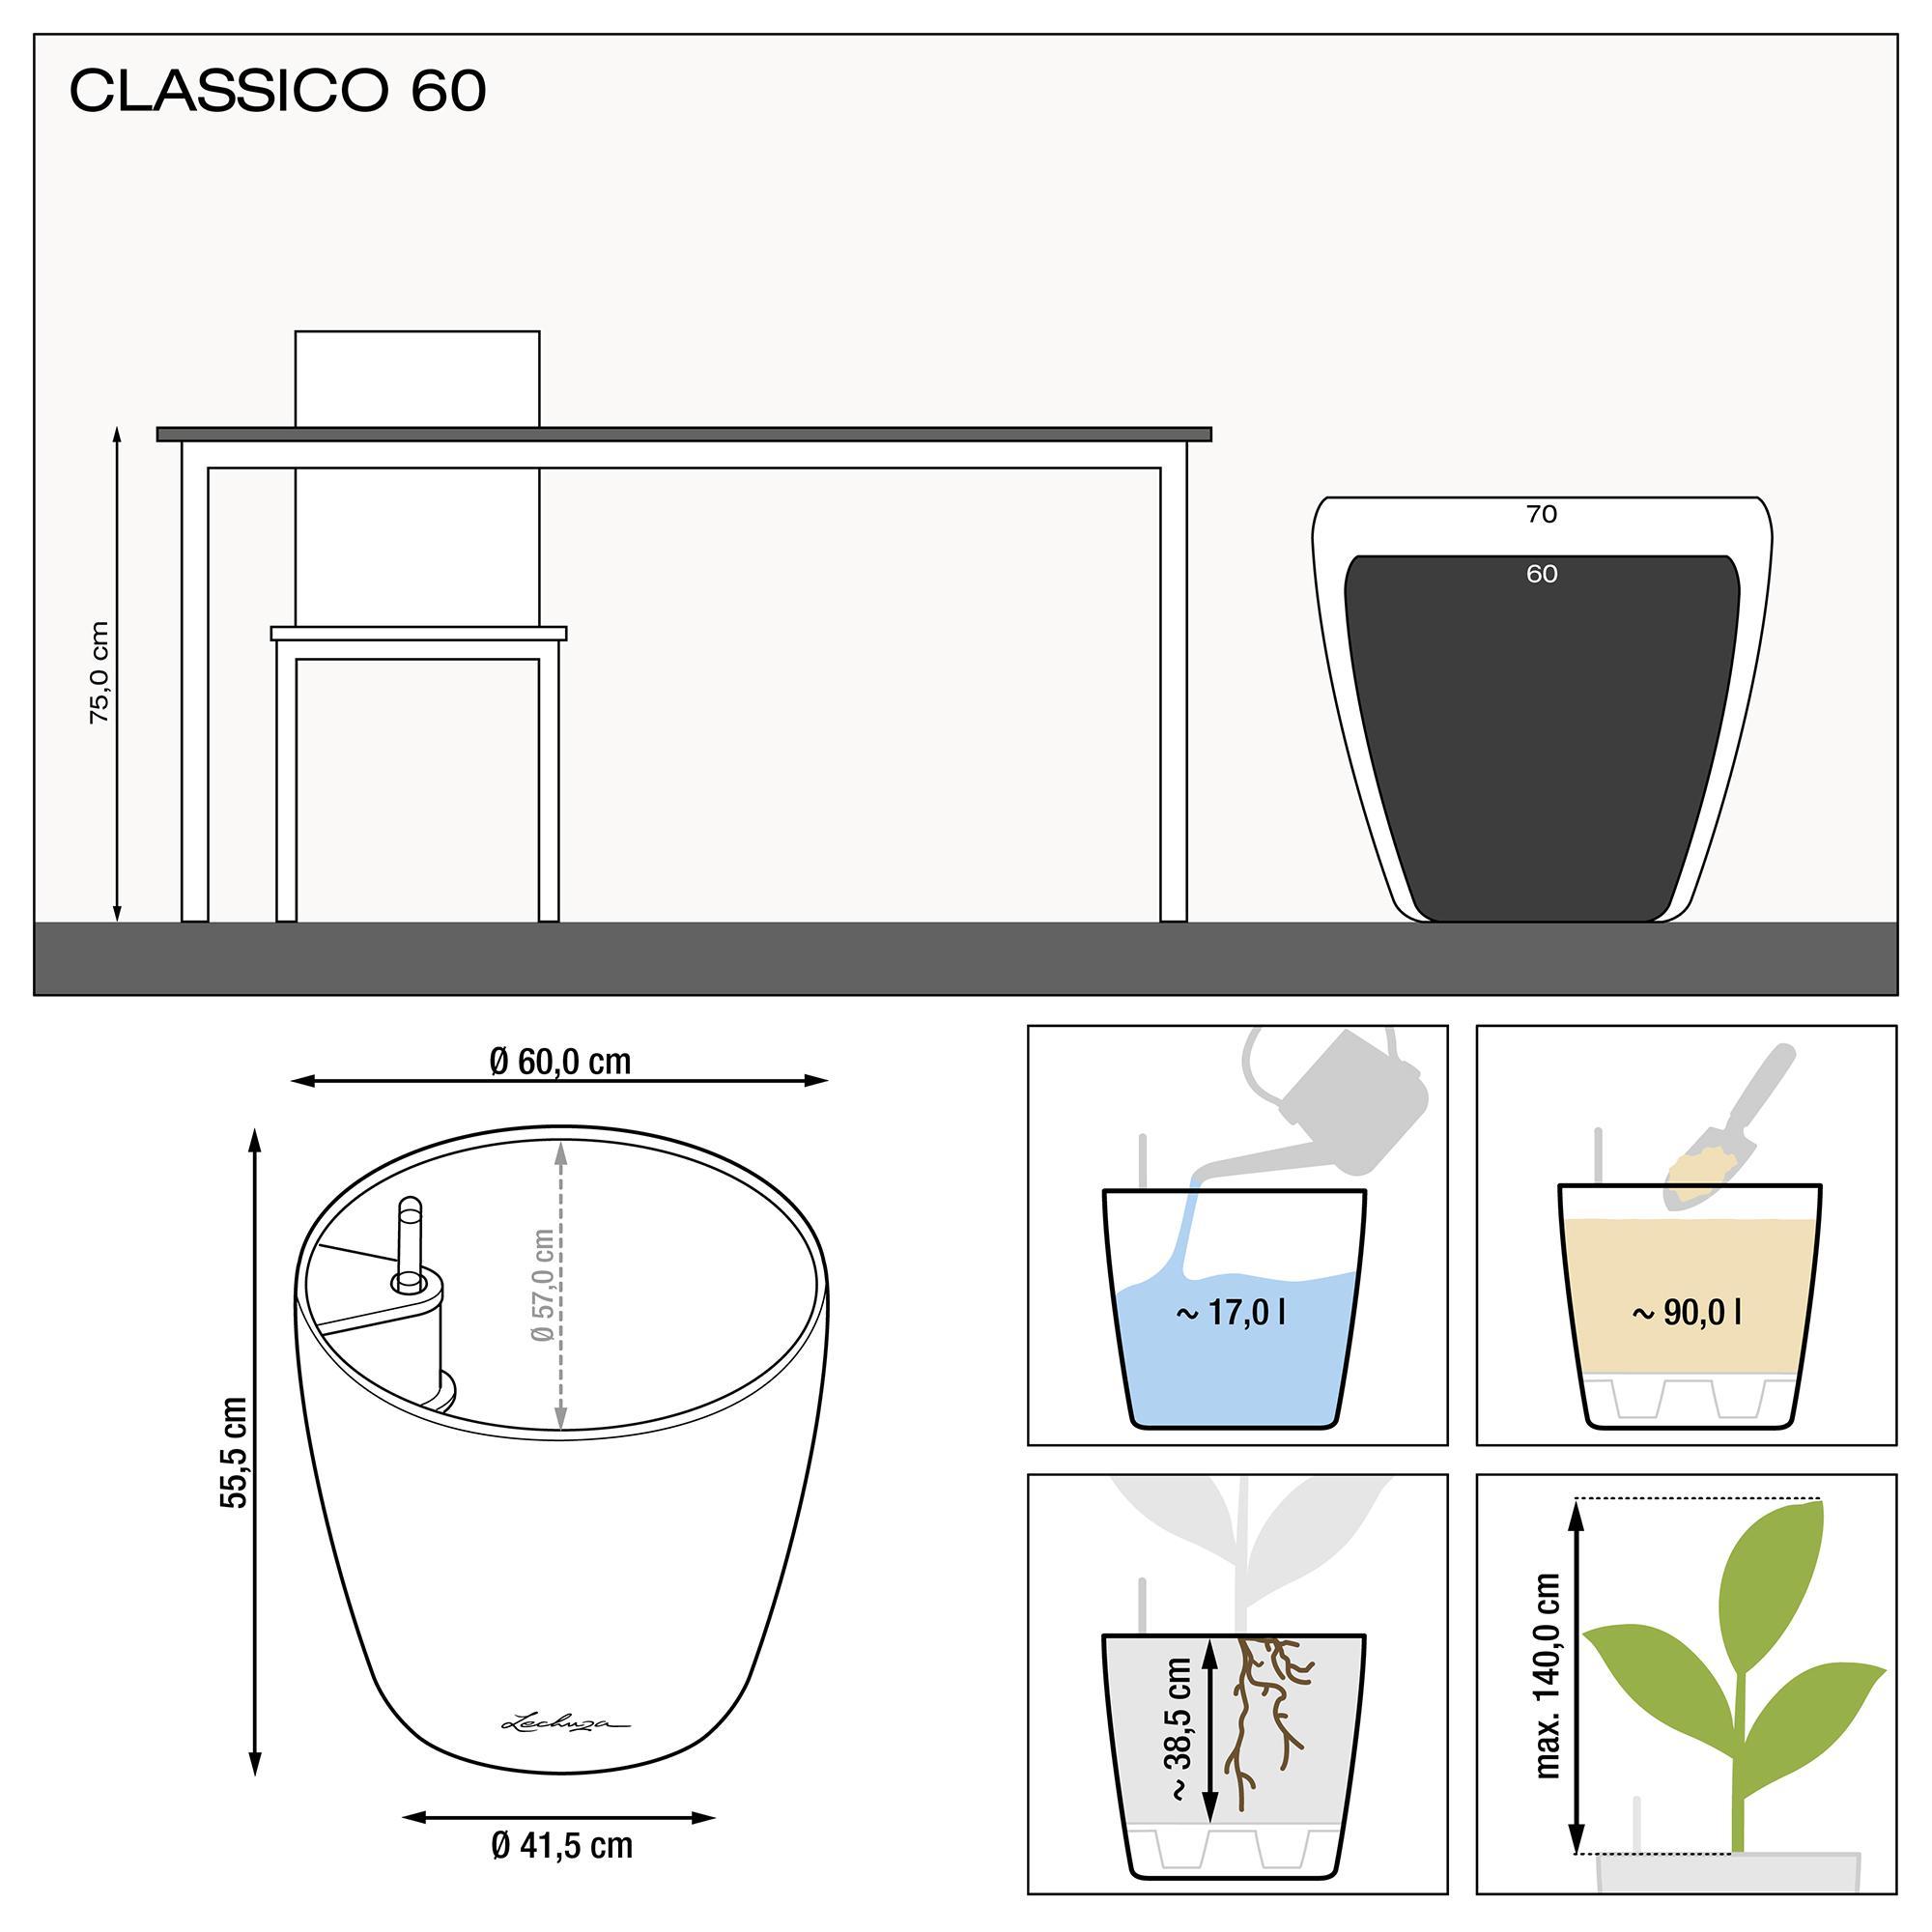 CLASSICO 60 tortora lucido - Immagine 2